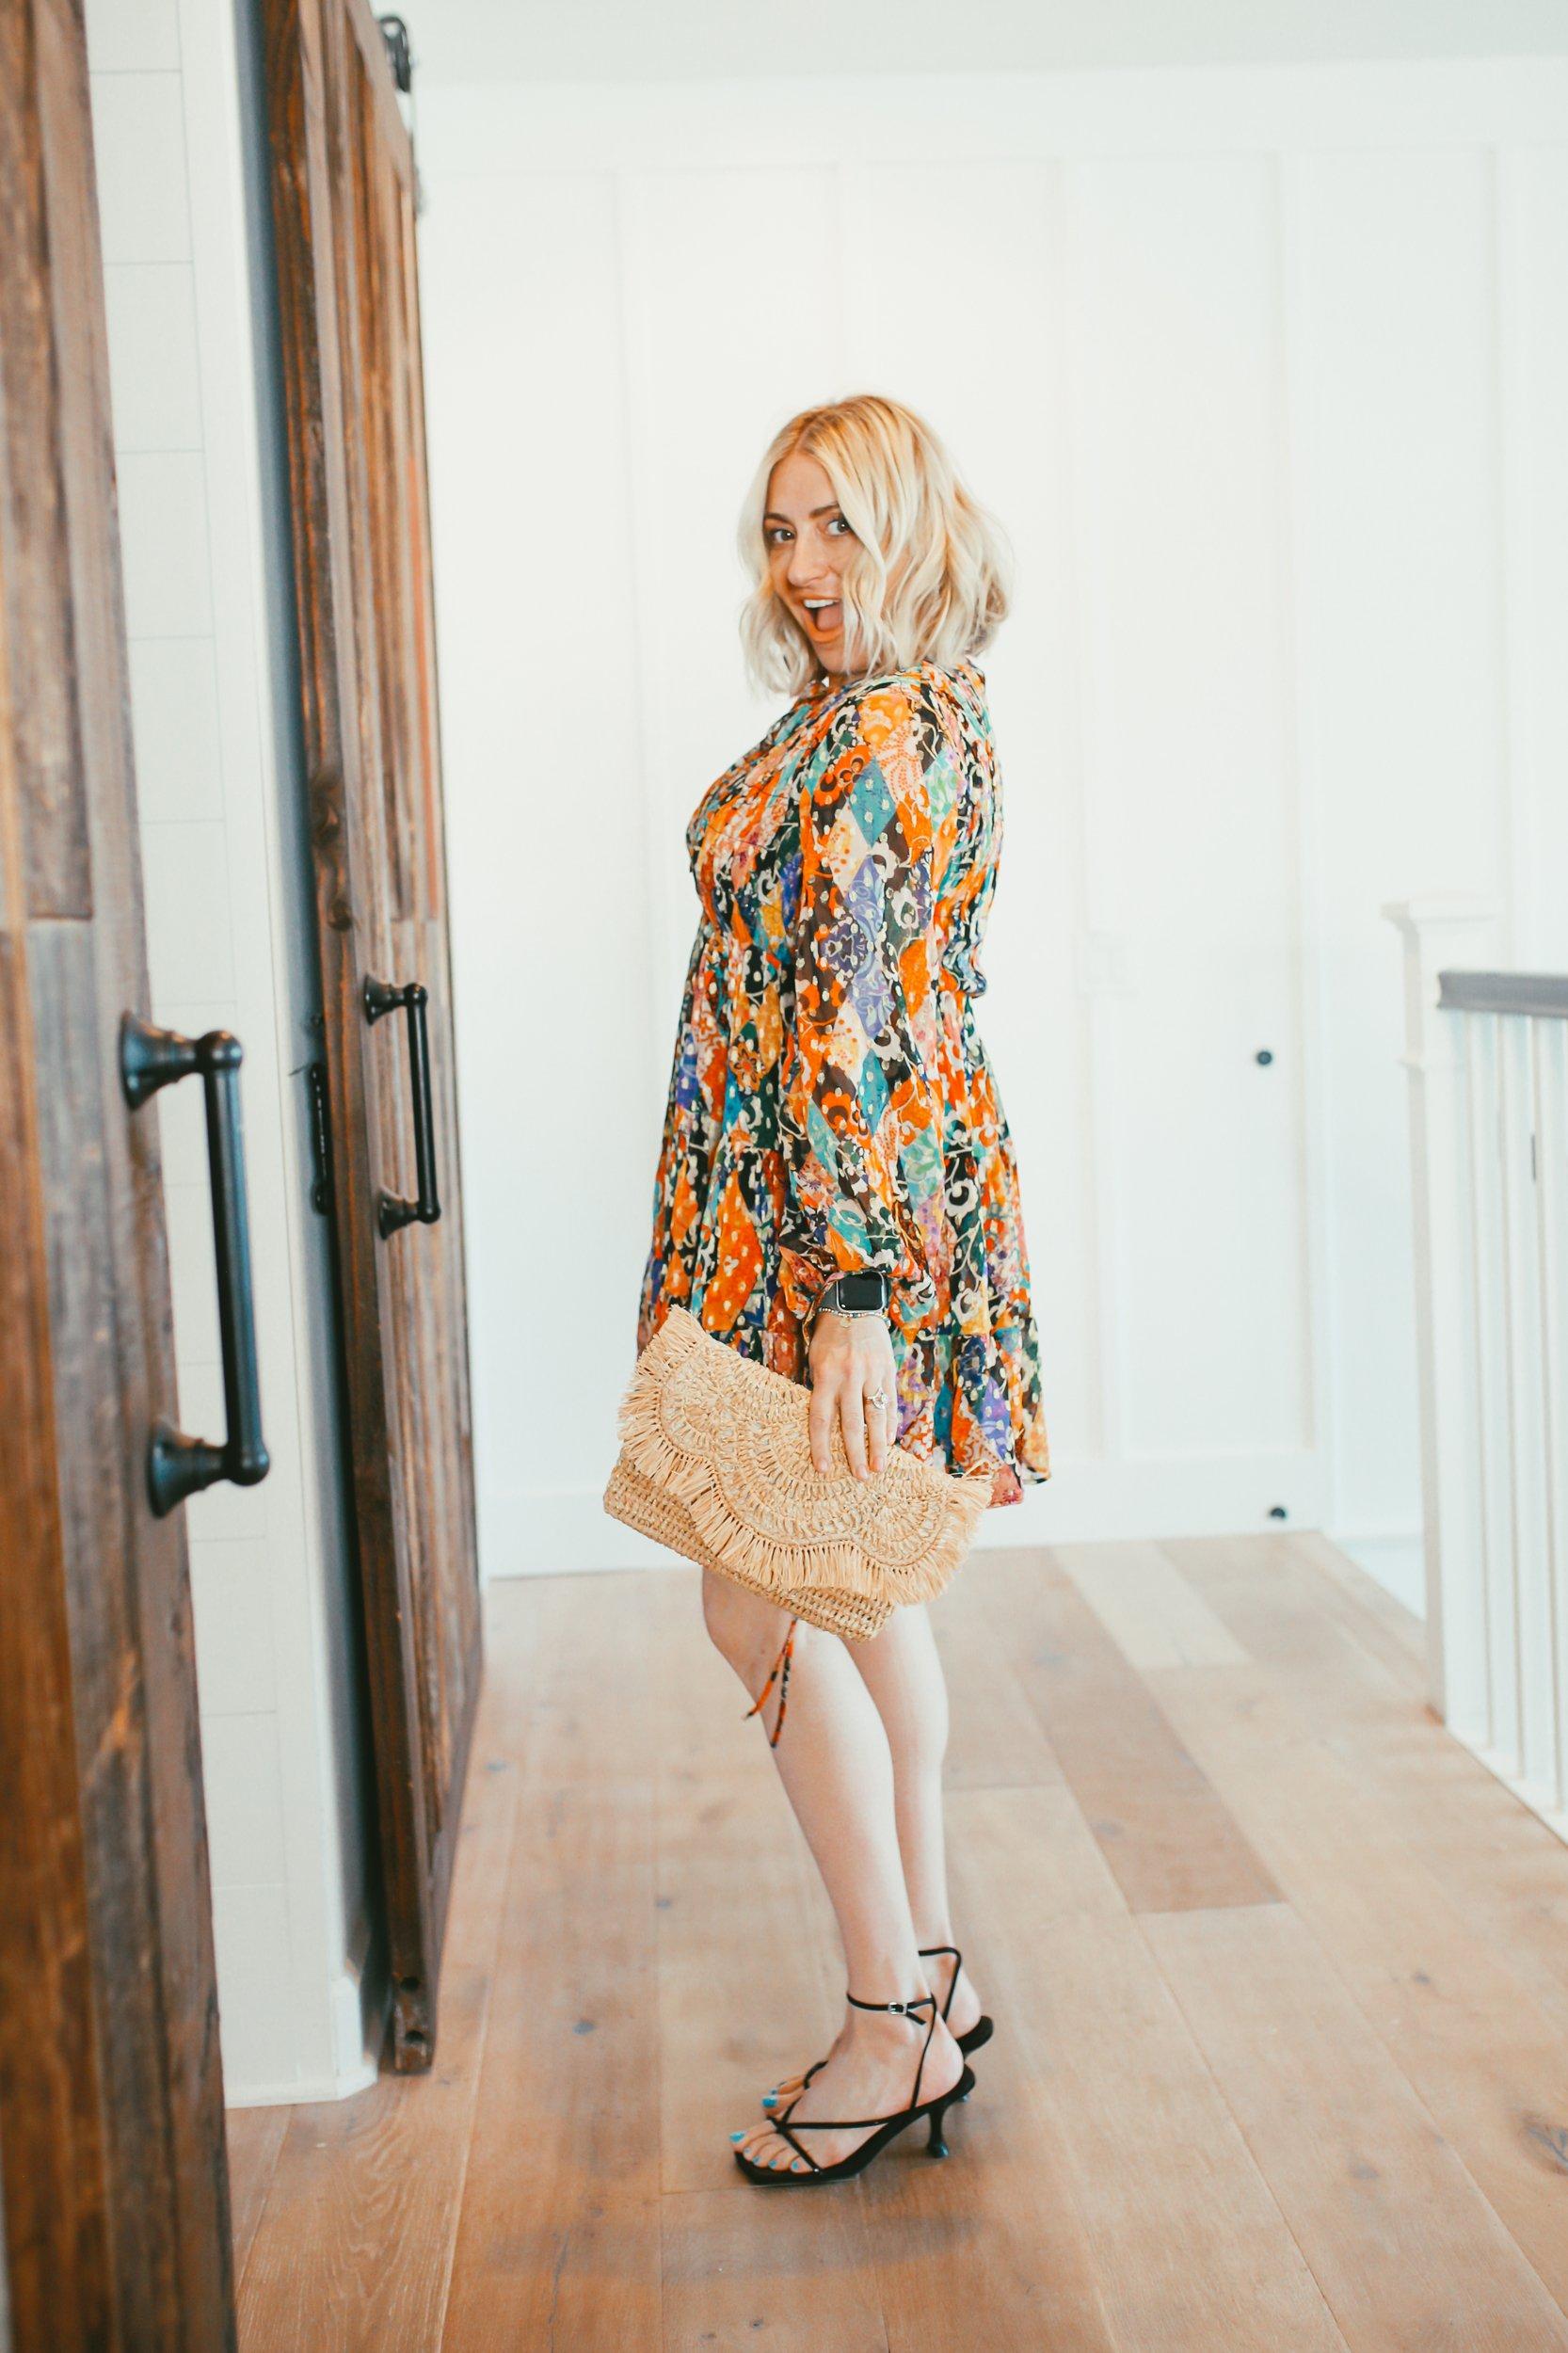 woman posing in hallway